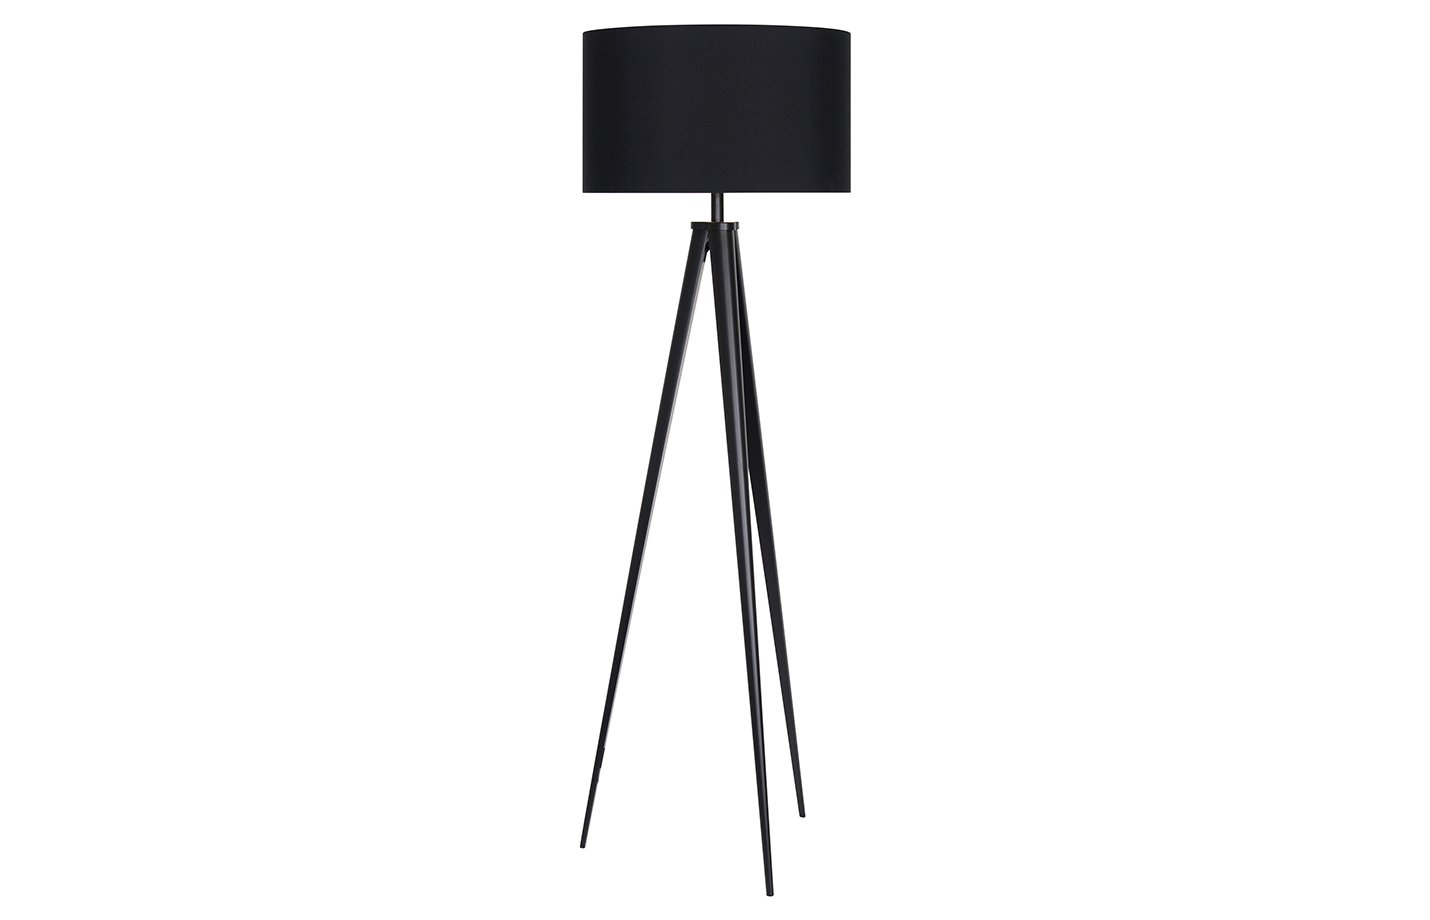 Paso basic 50 F1 Floor lamp – Black